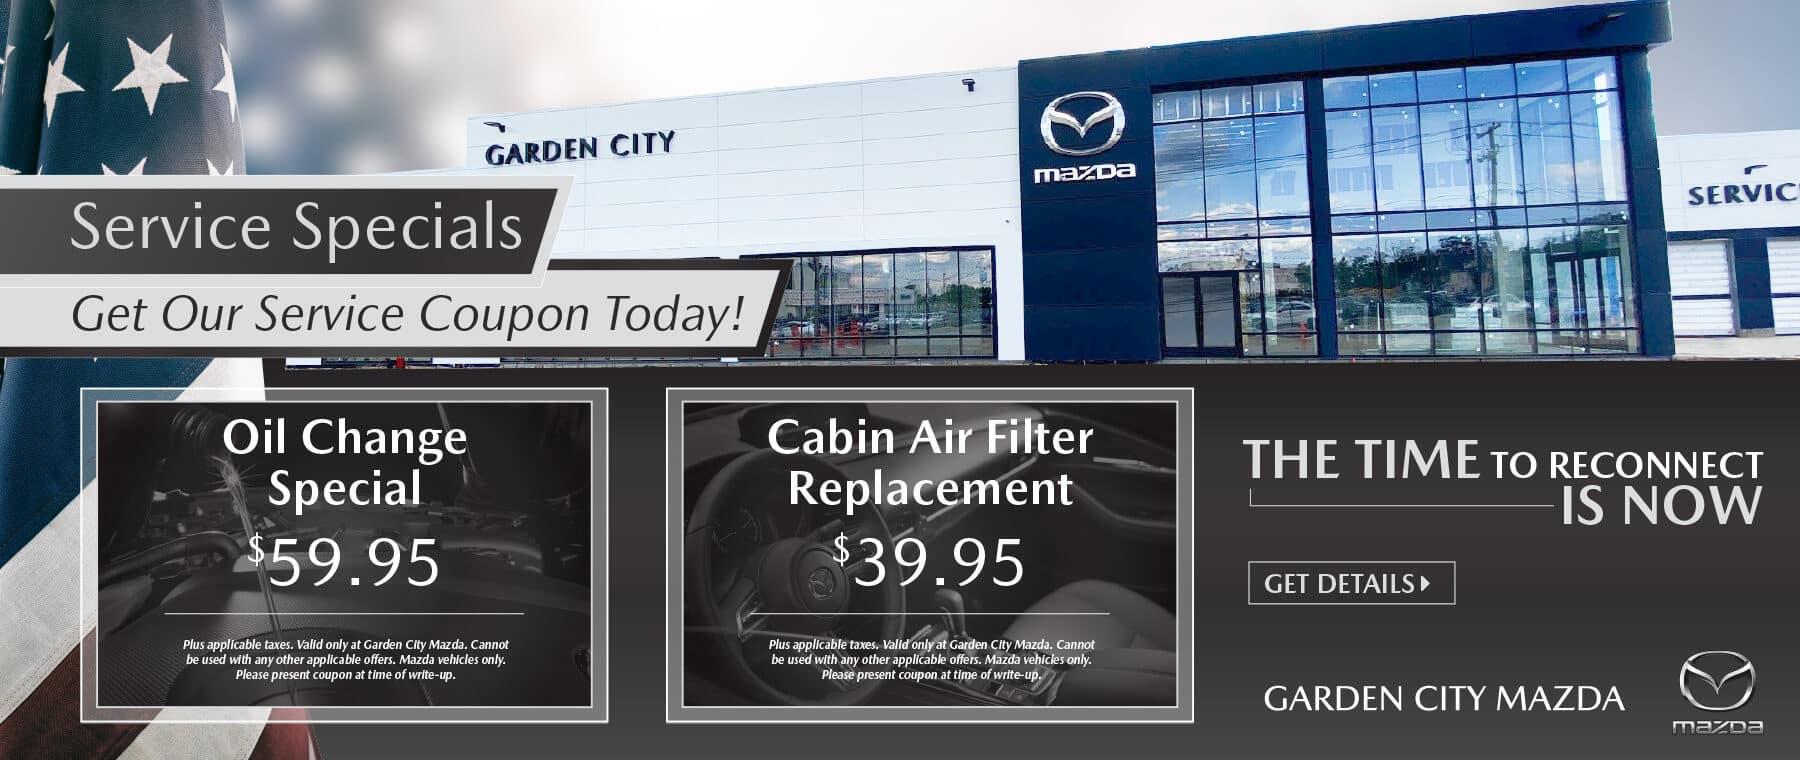 2021.06.25_Garden-City-Mazda-July-Web_S52901ll-3